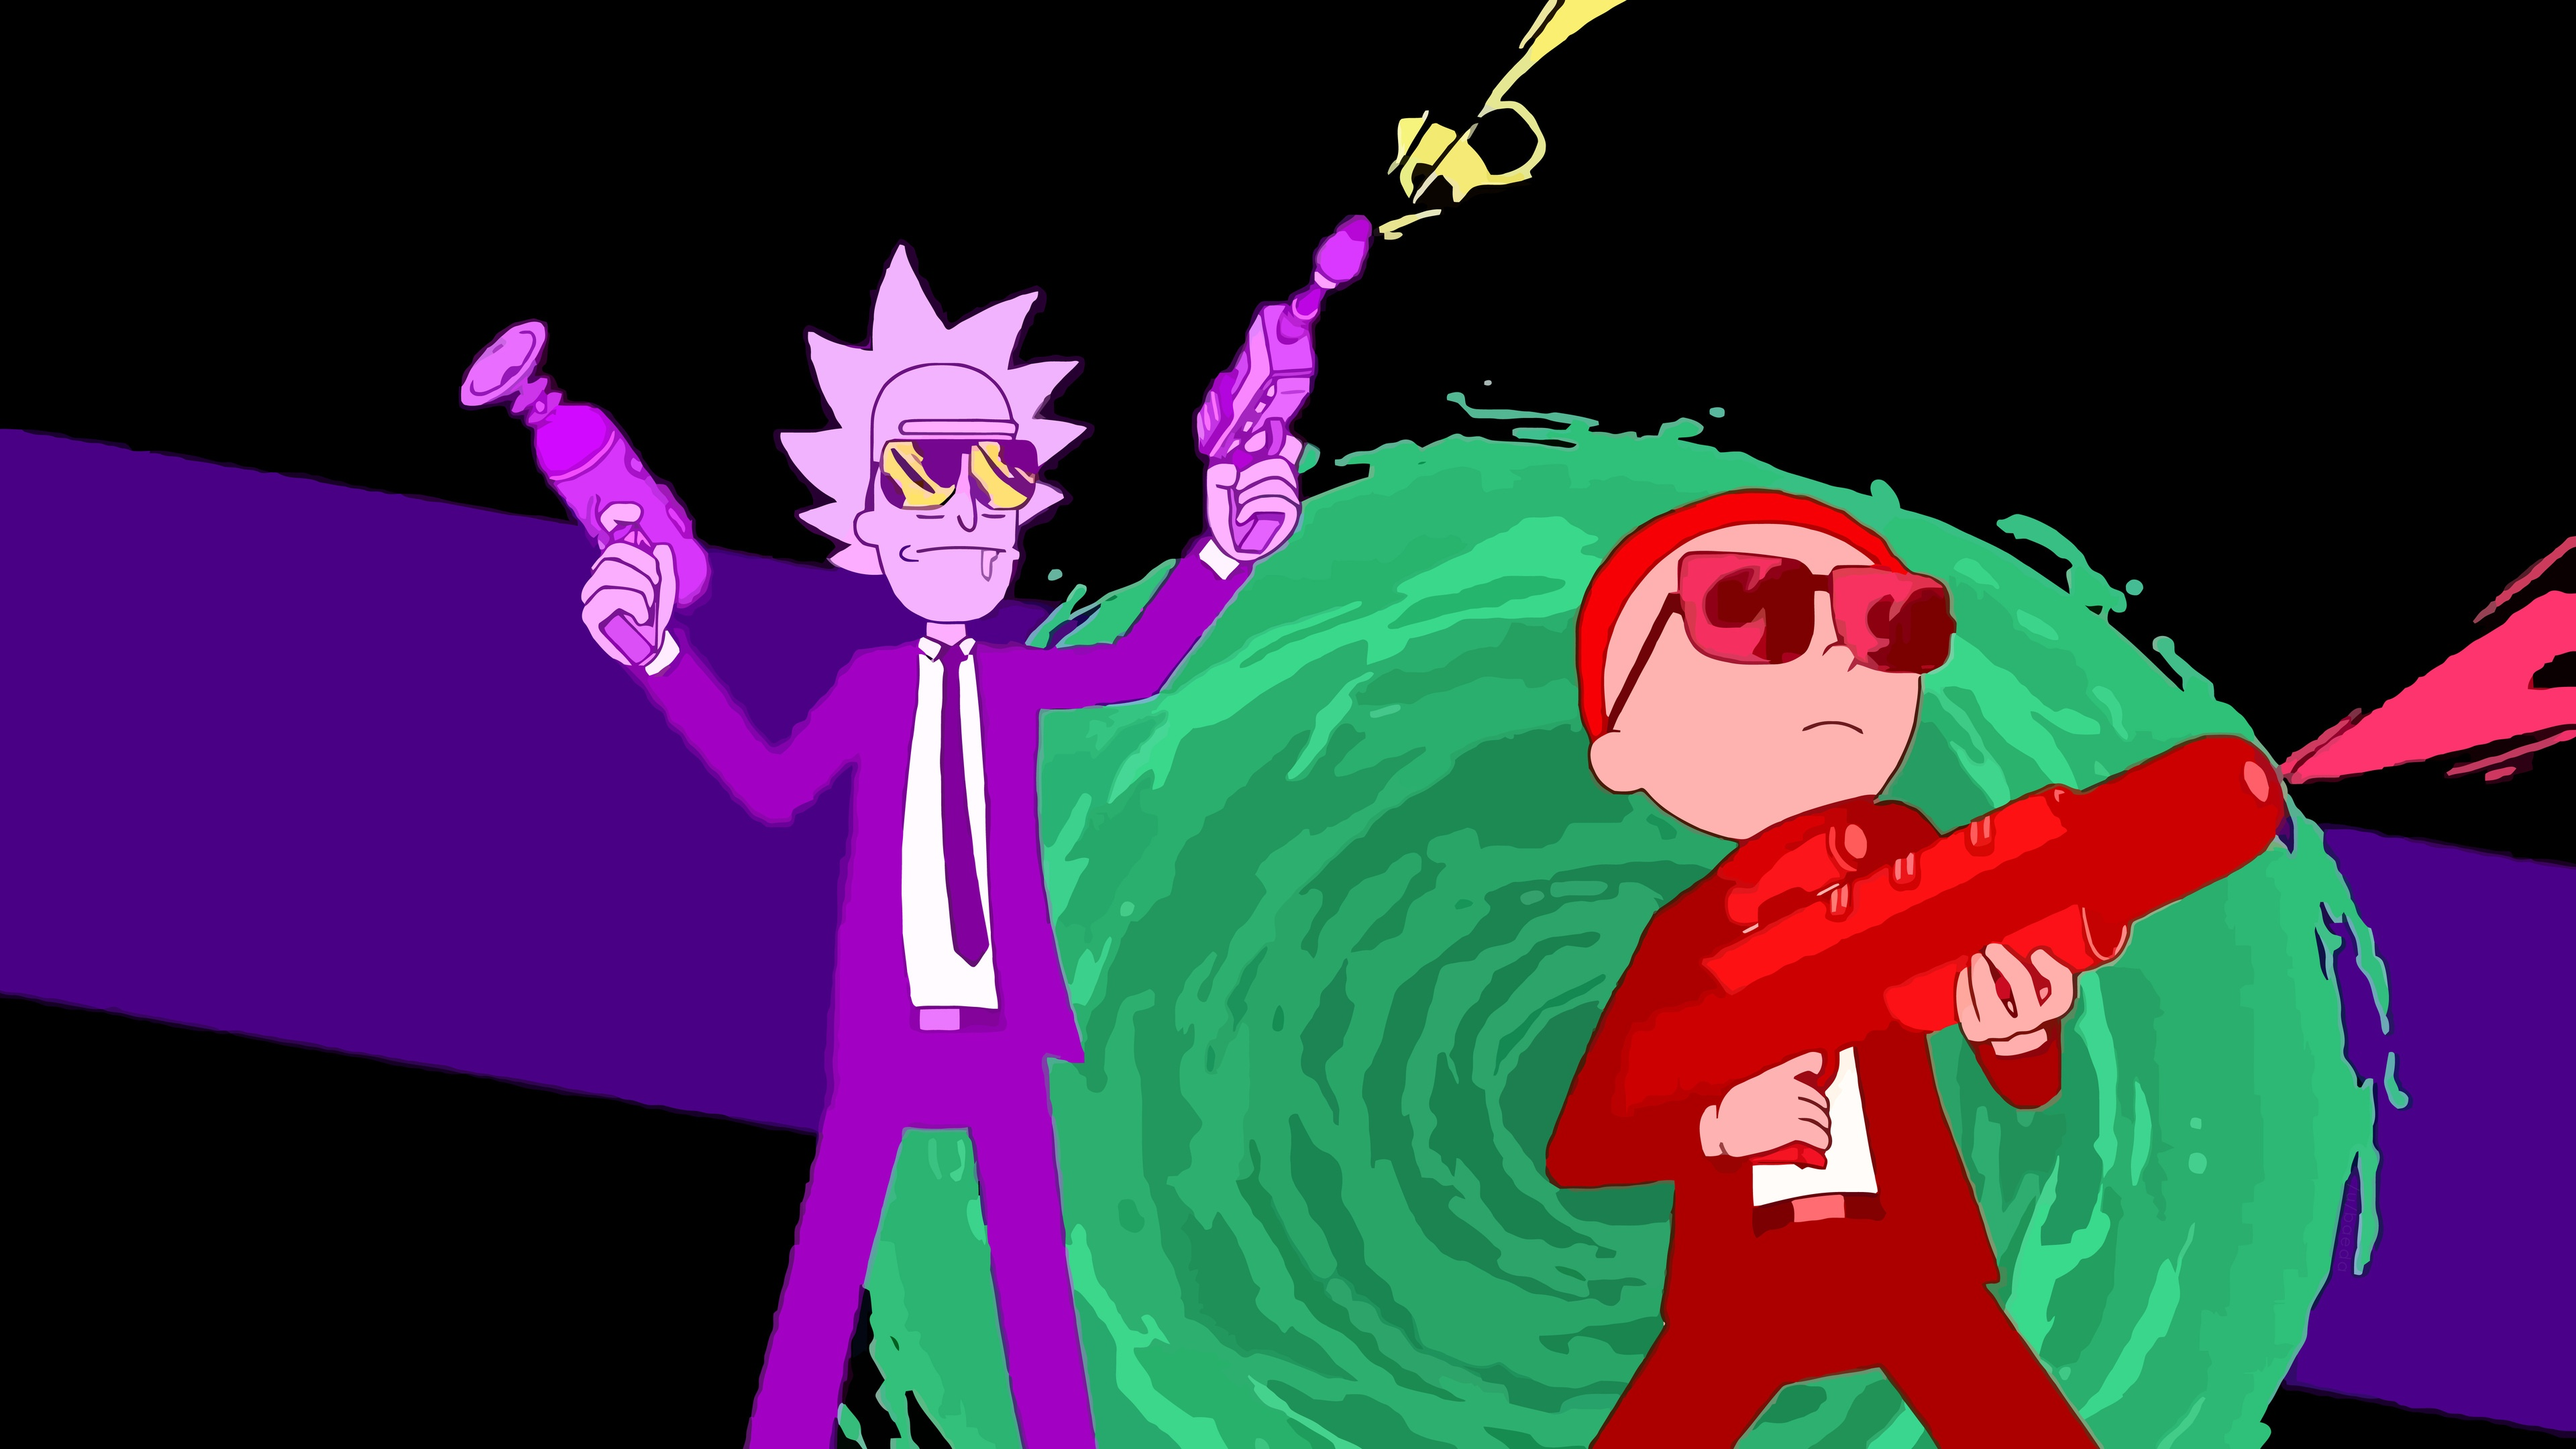 Rick And Morty Art desktop background